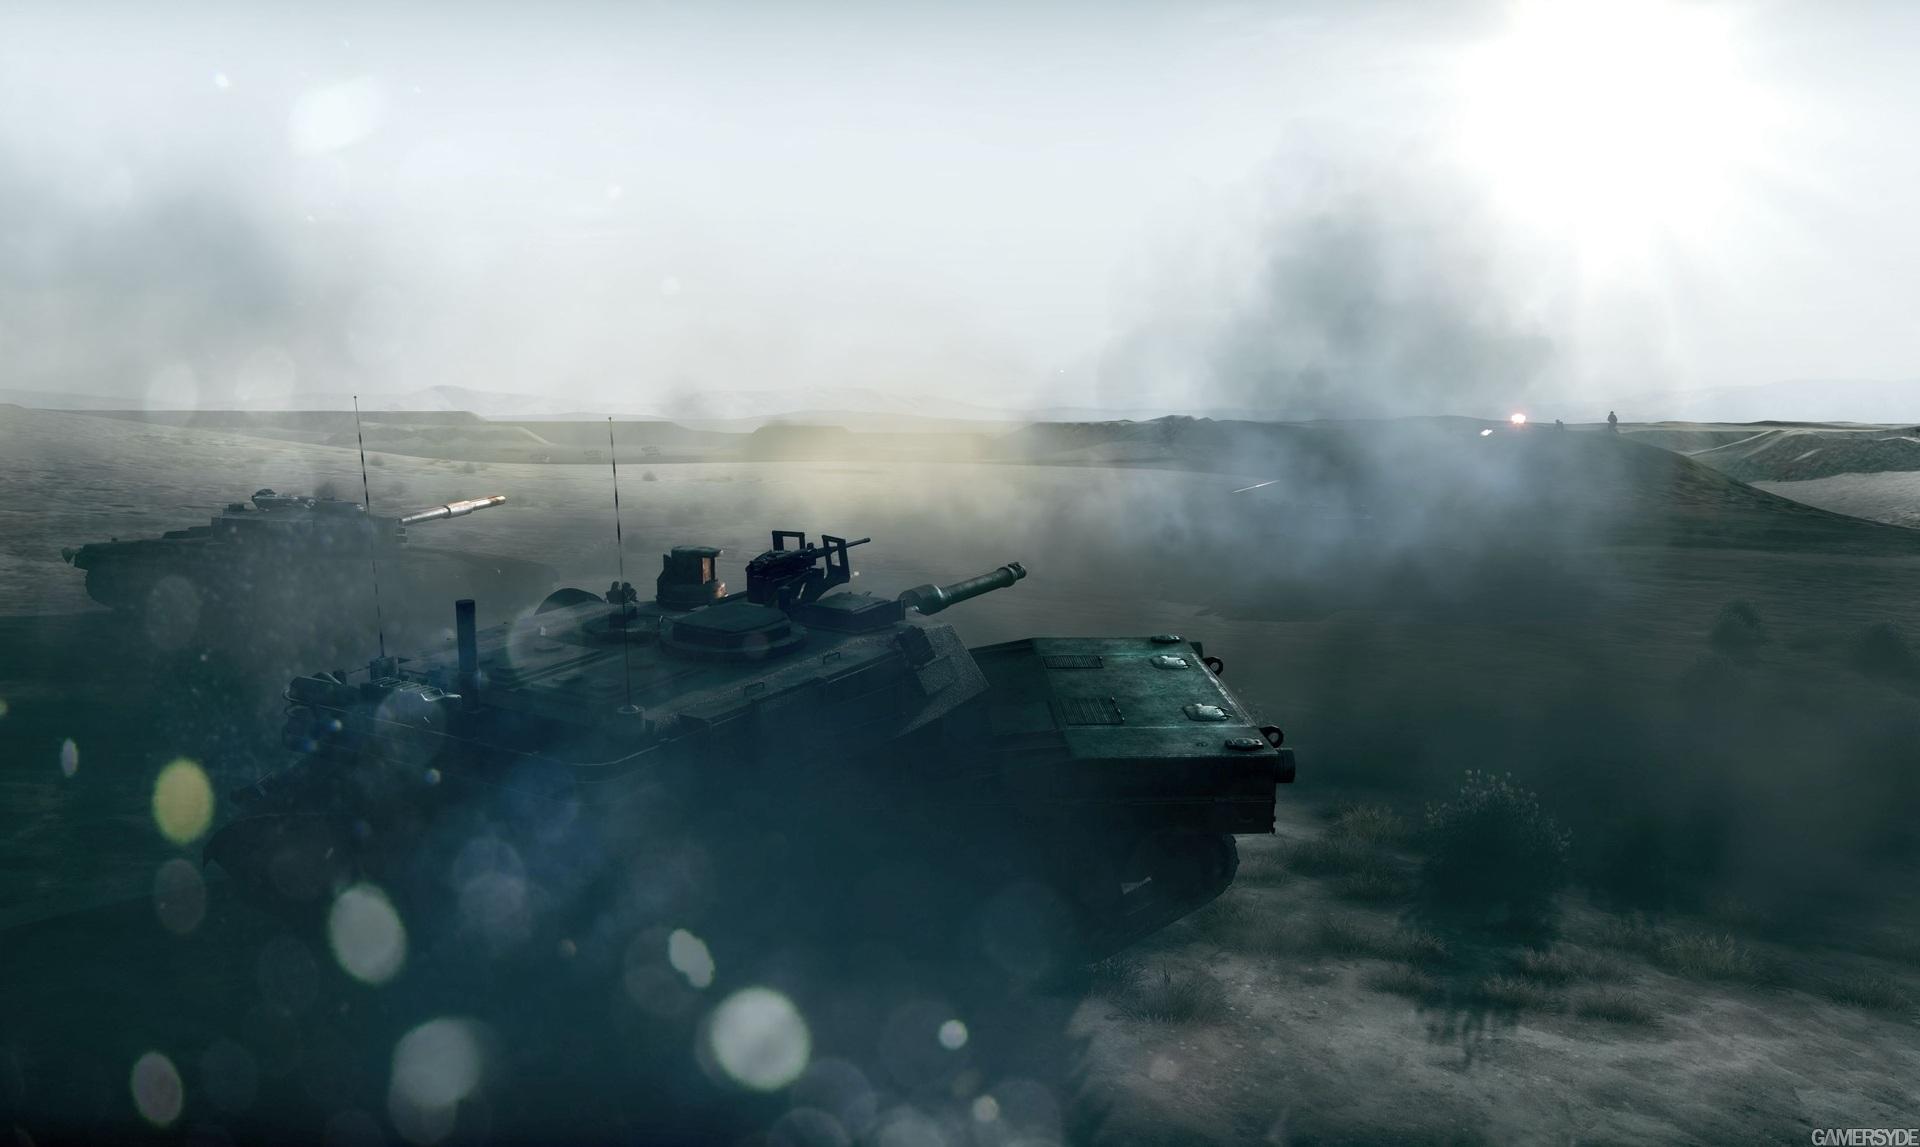 image_battlefield_3-16657-2220_0008.jpg